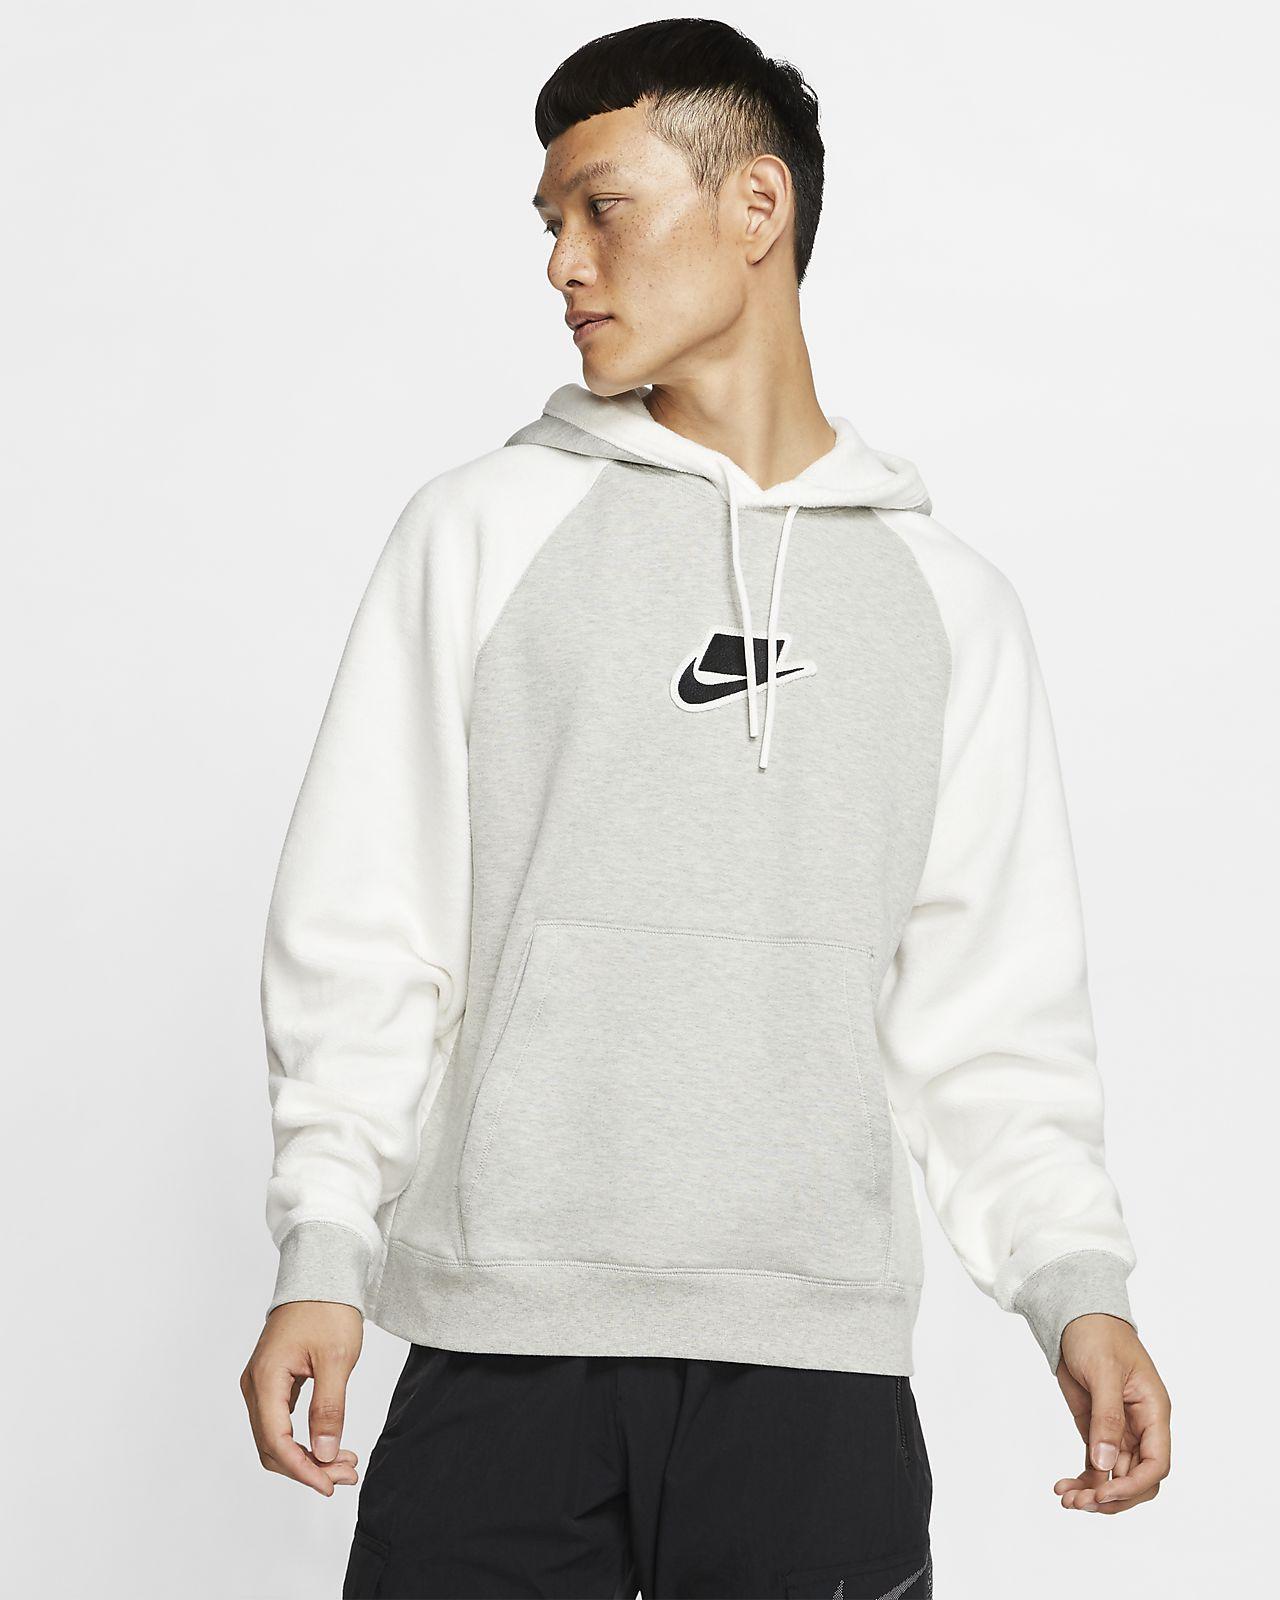 Nike Sportswear Nike Sport Pack 男子针织套头连帽衫